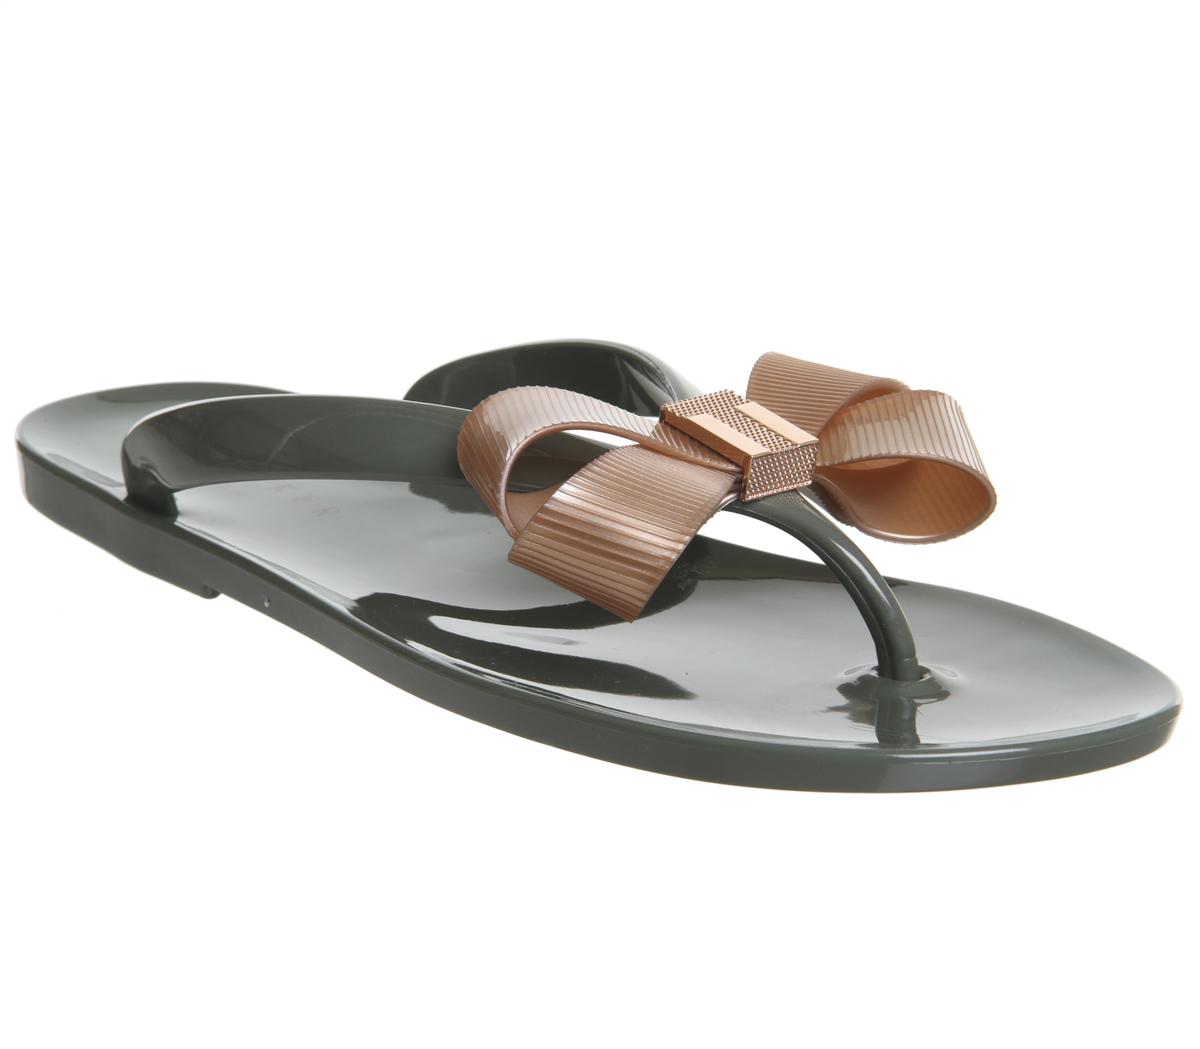 7e6b30b46 Sentinel Womens Ted Baker Suszie Flip Flops Khaki Rose Gold Sandals